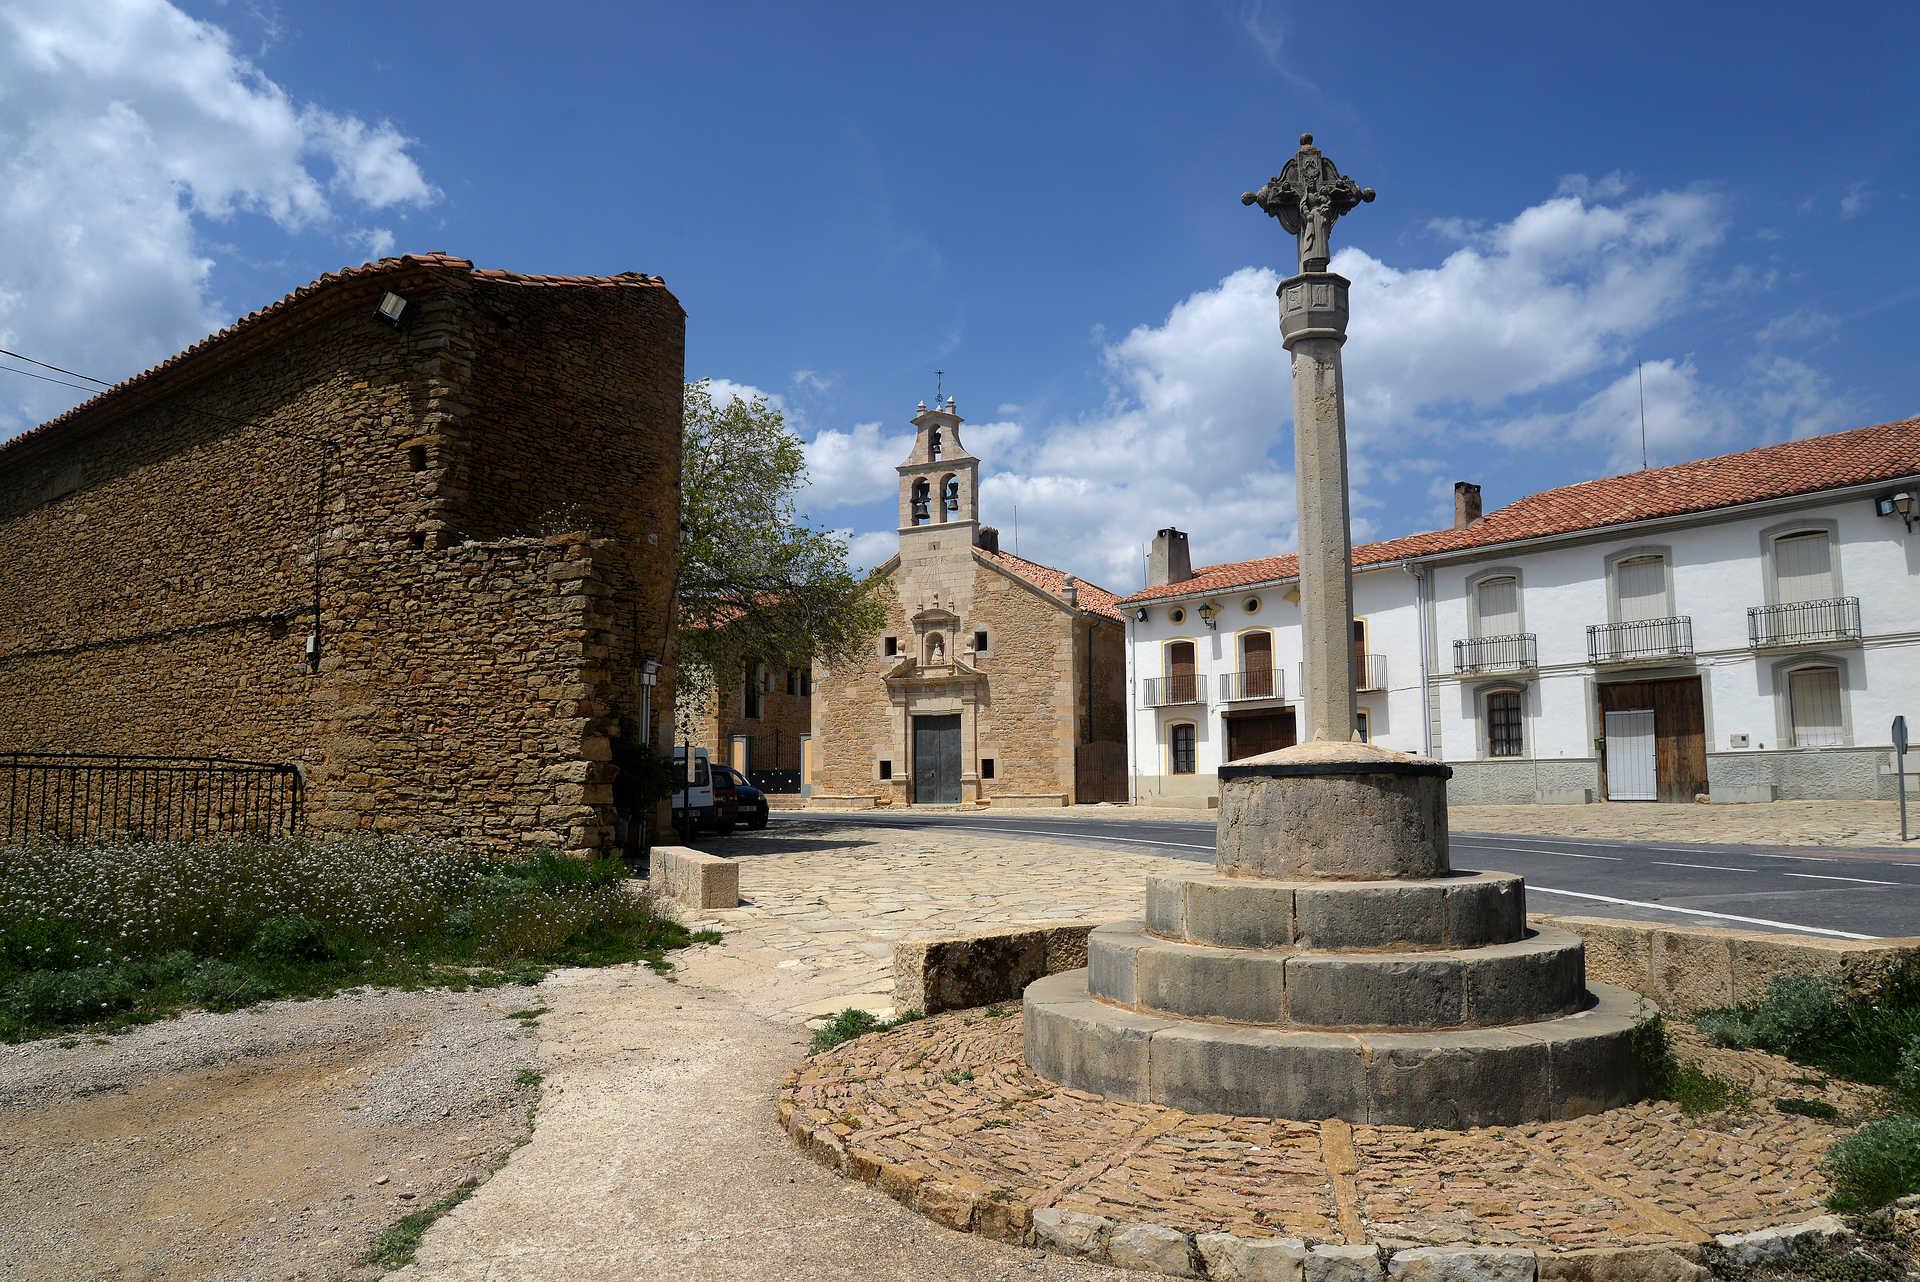 Vilafranca/Villafranca del Cid